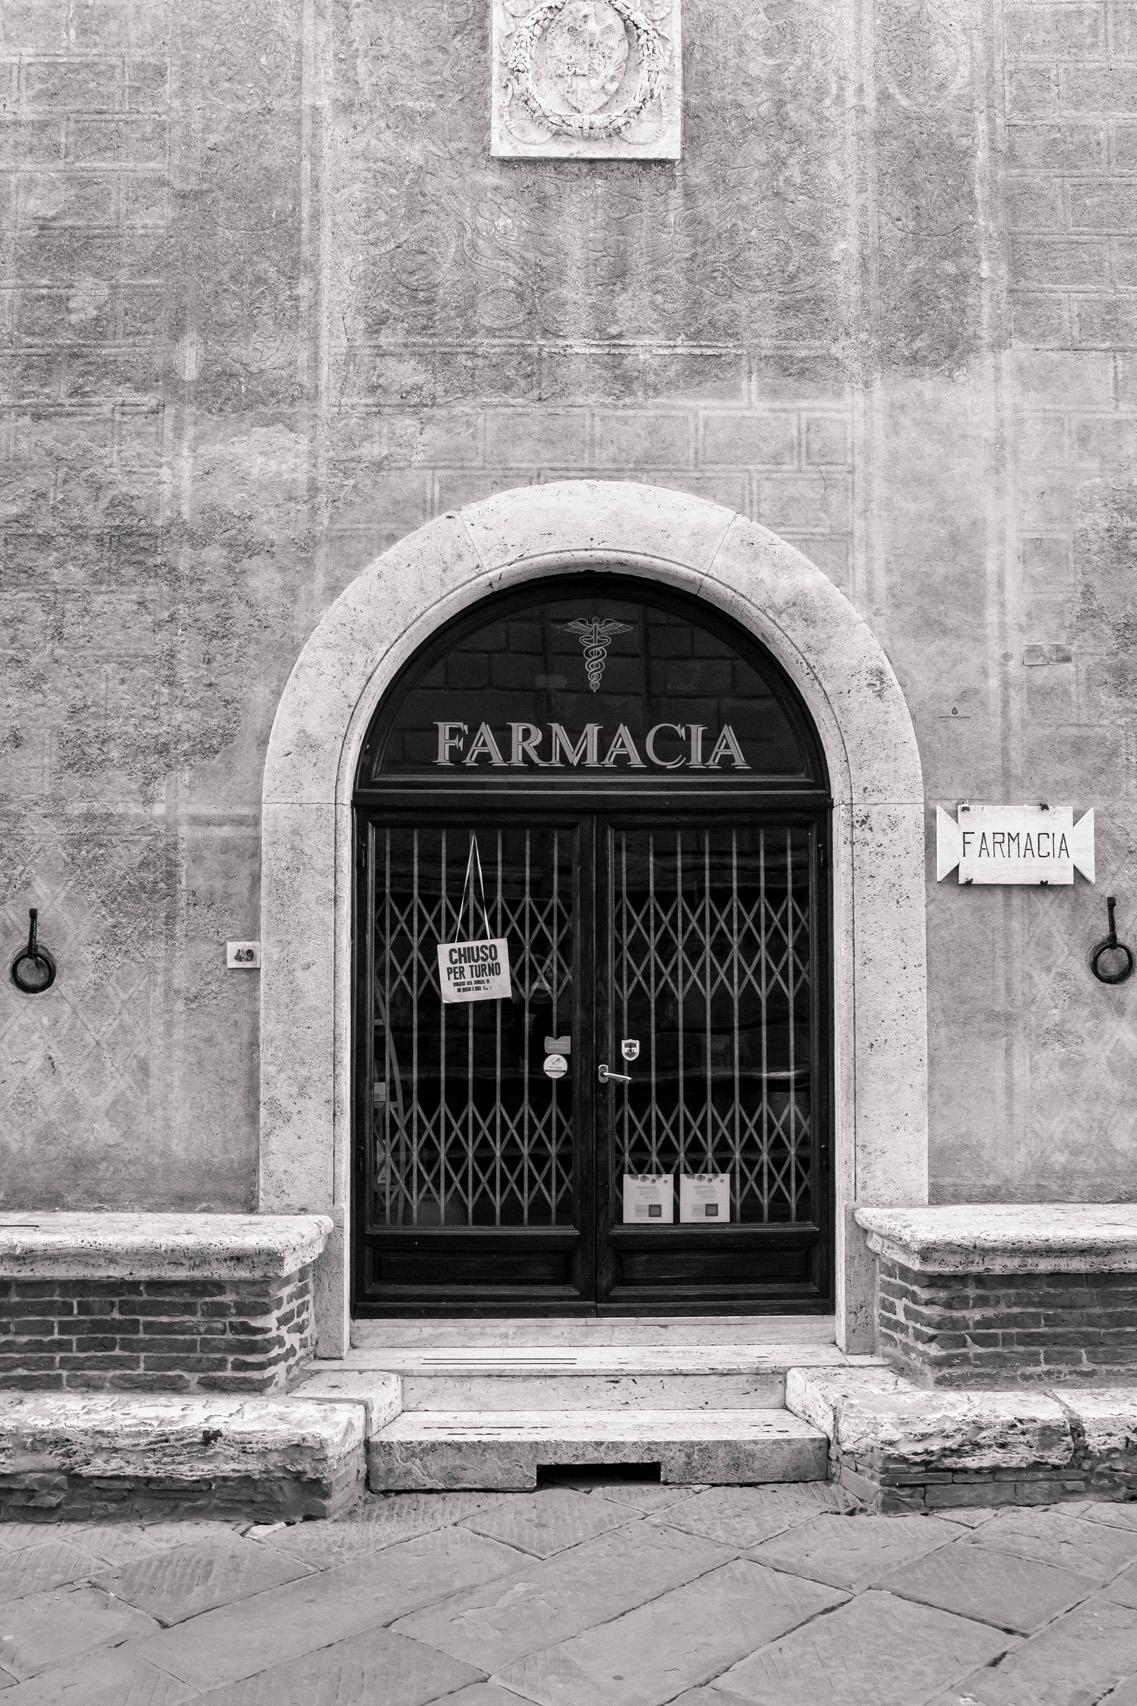 Pharmacy in Pienza, Tuscany